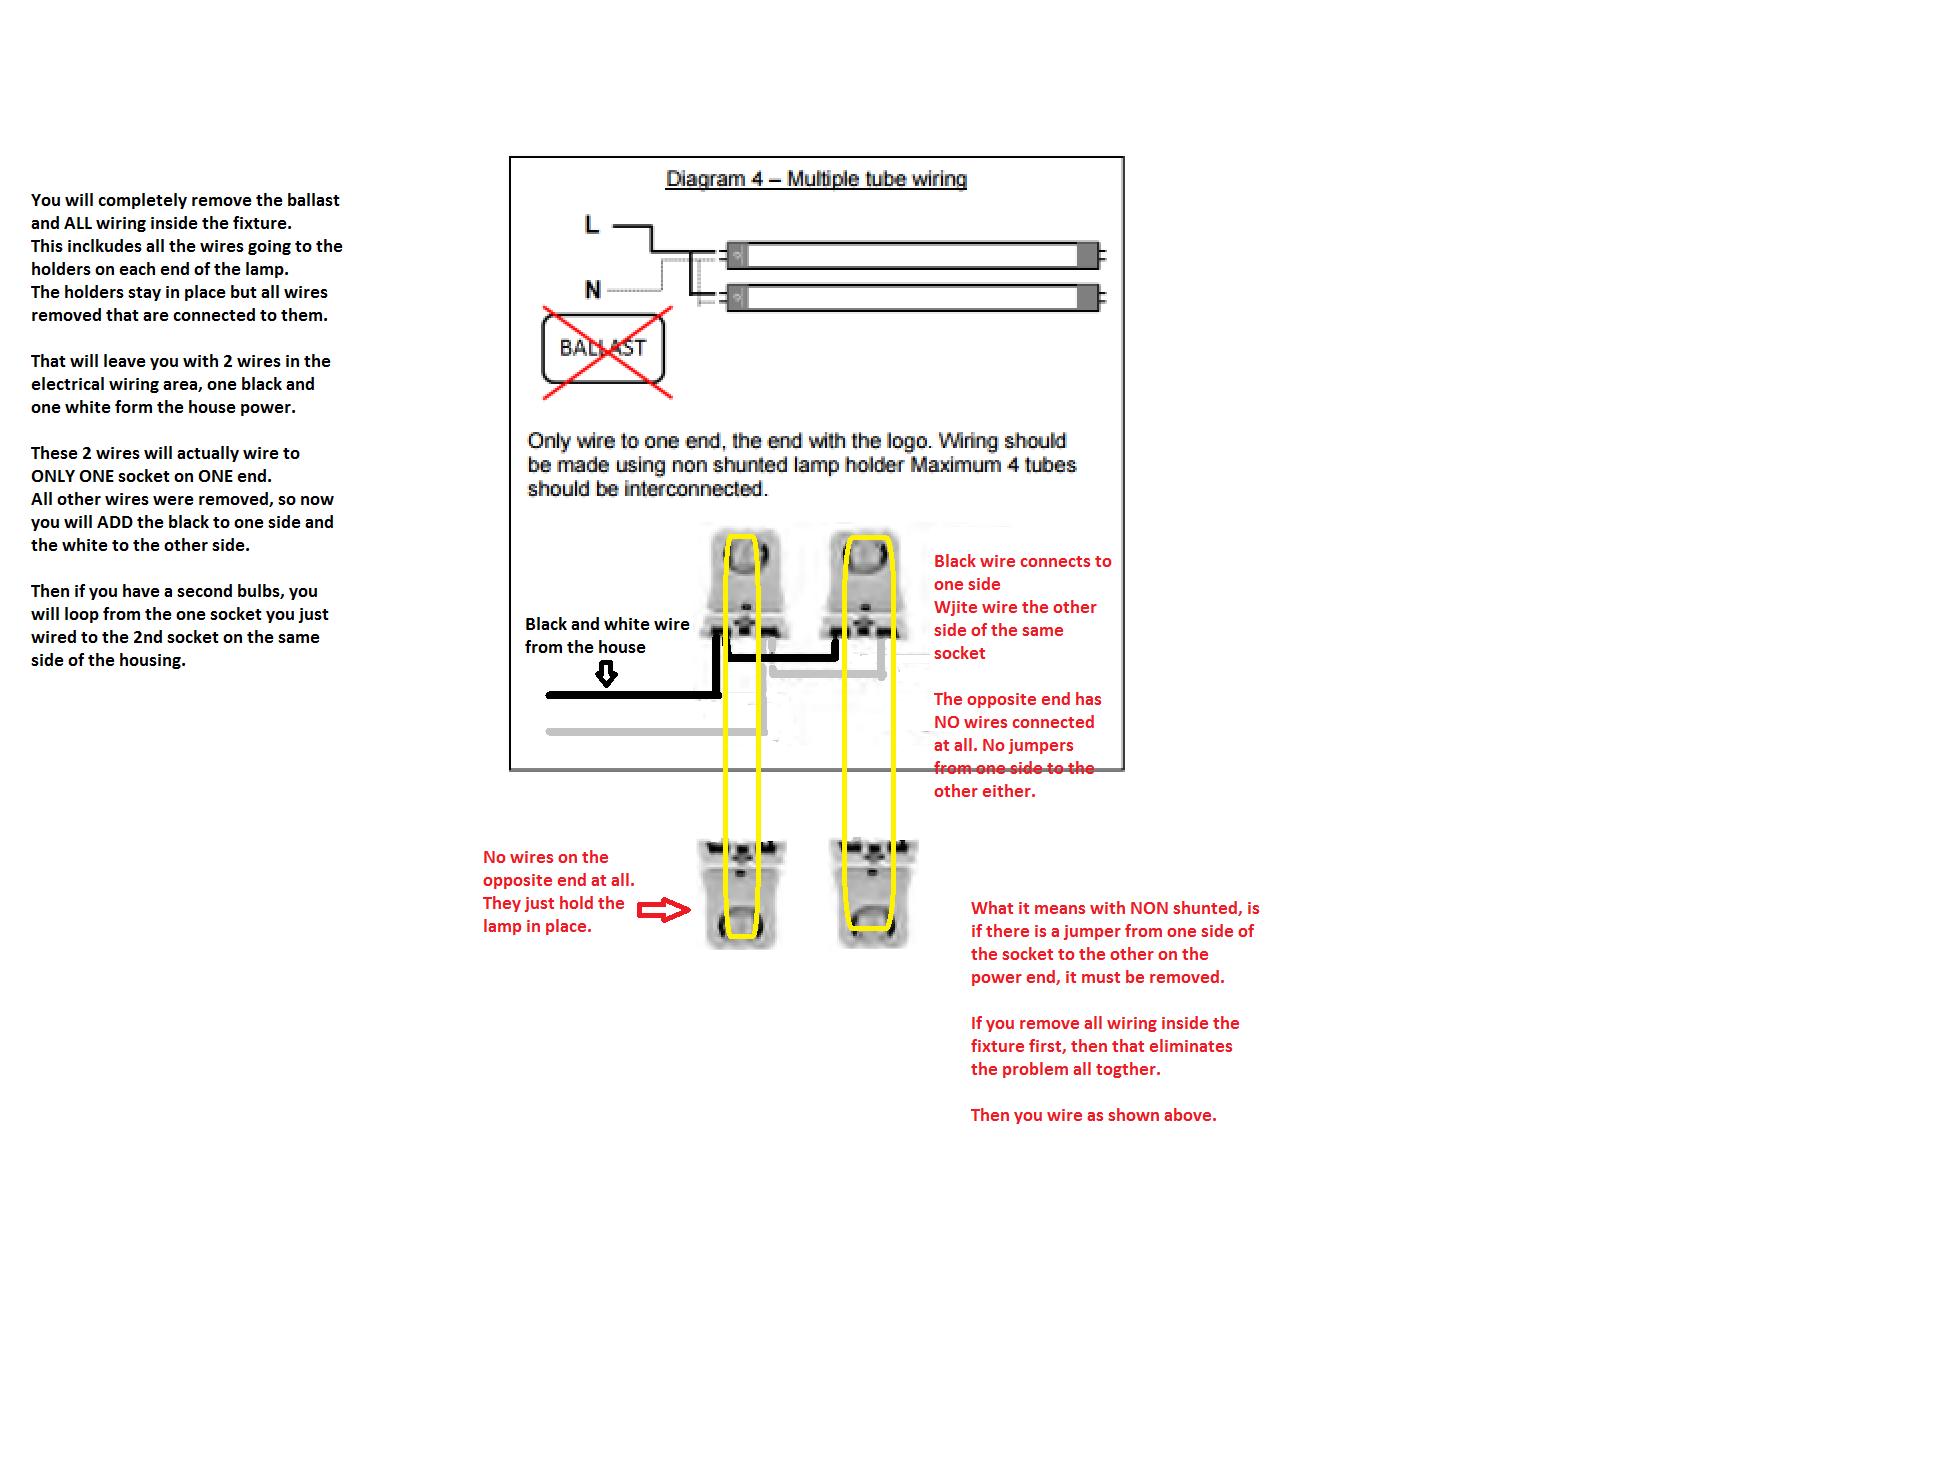 Berühmt Wiring Problems In House Ideen - Schaltplan Serie Circuit ...